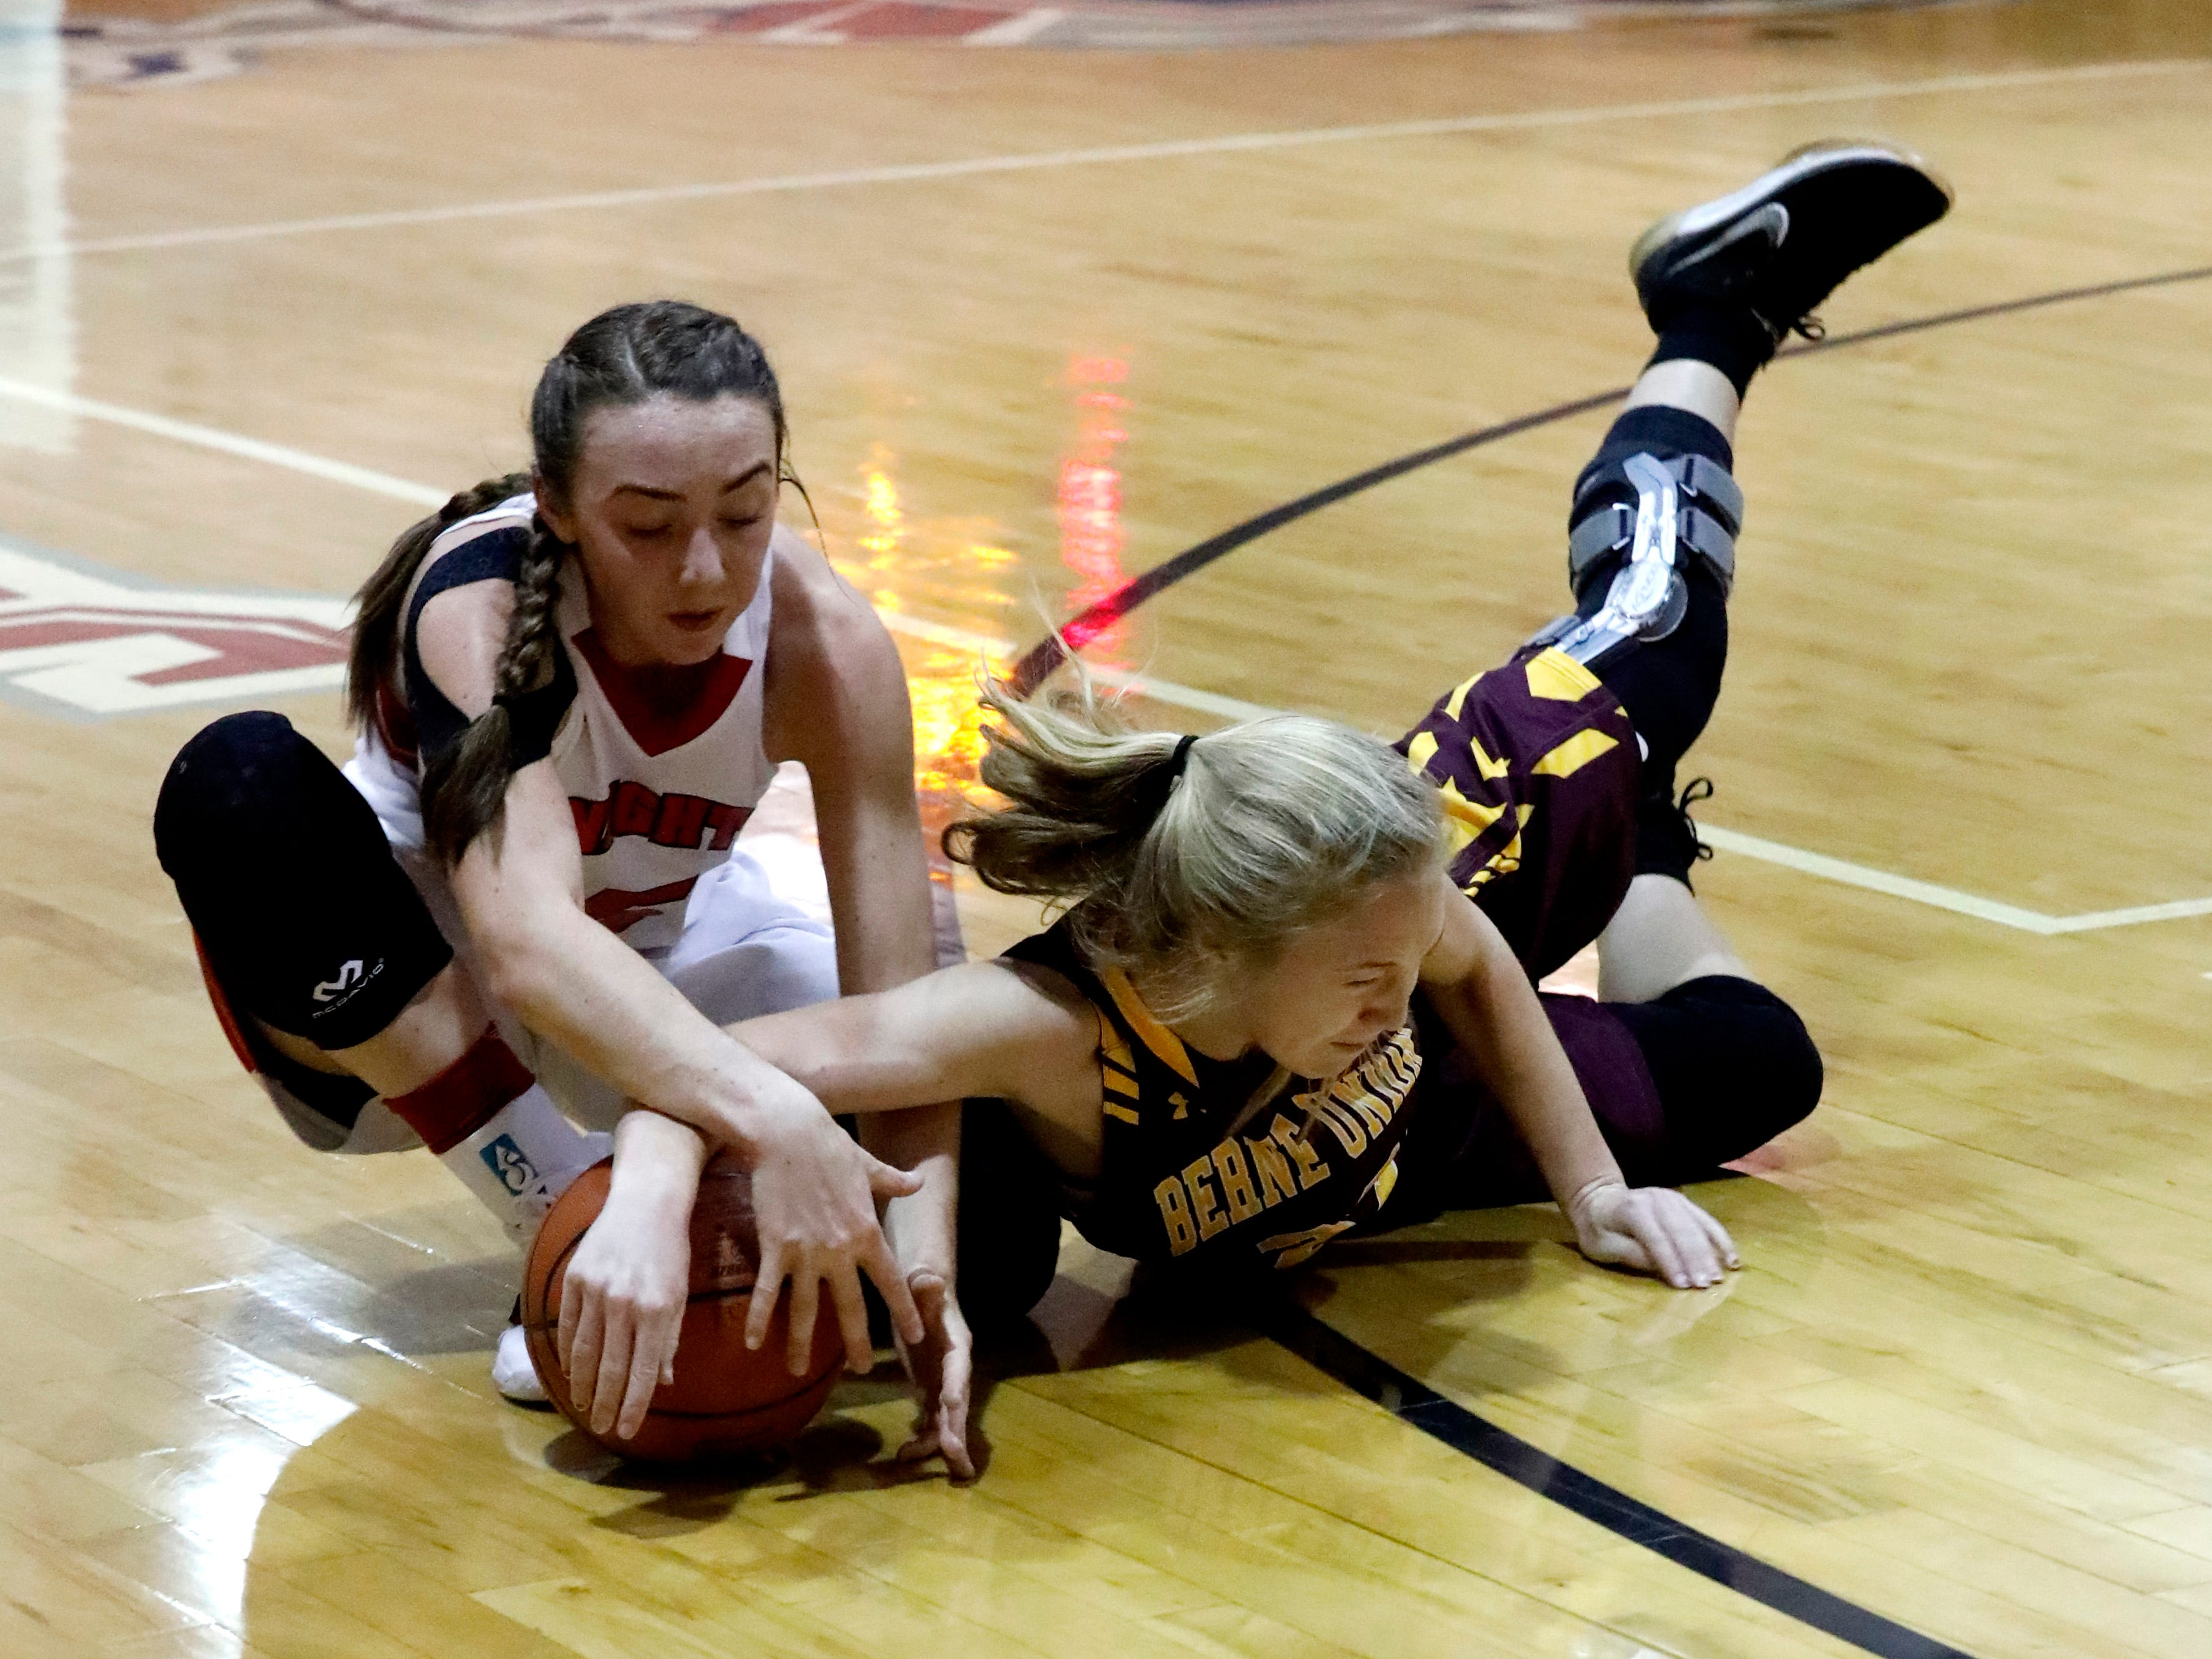 Fairfield Christian defeated Berne Union 53-38 Friday night, Dec. 21, 2018, at Fairfield Christian Academy in Lancaster.